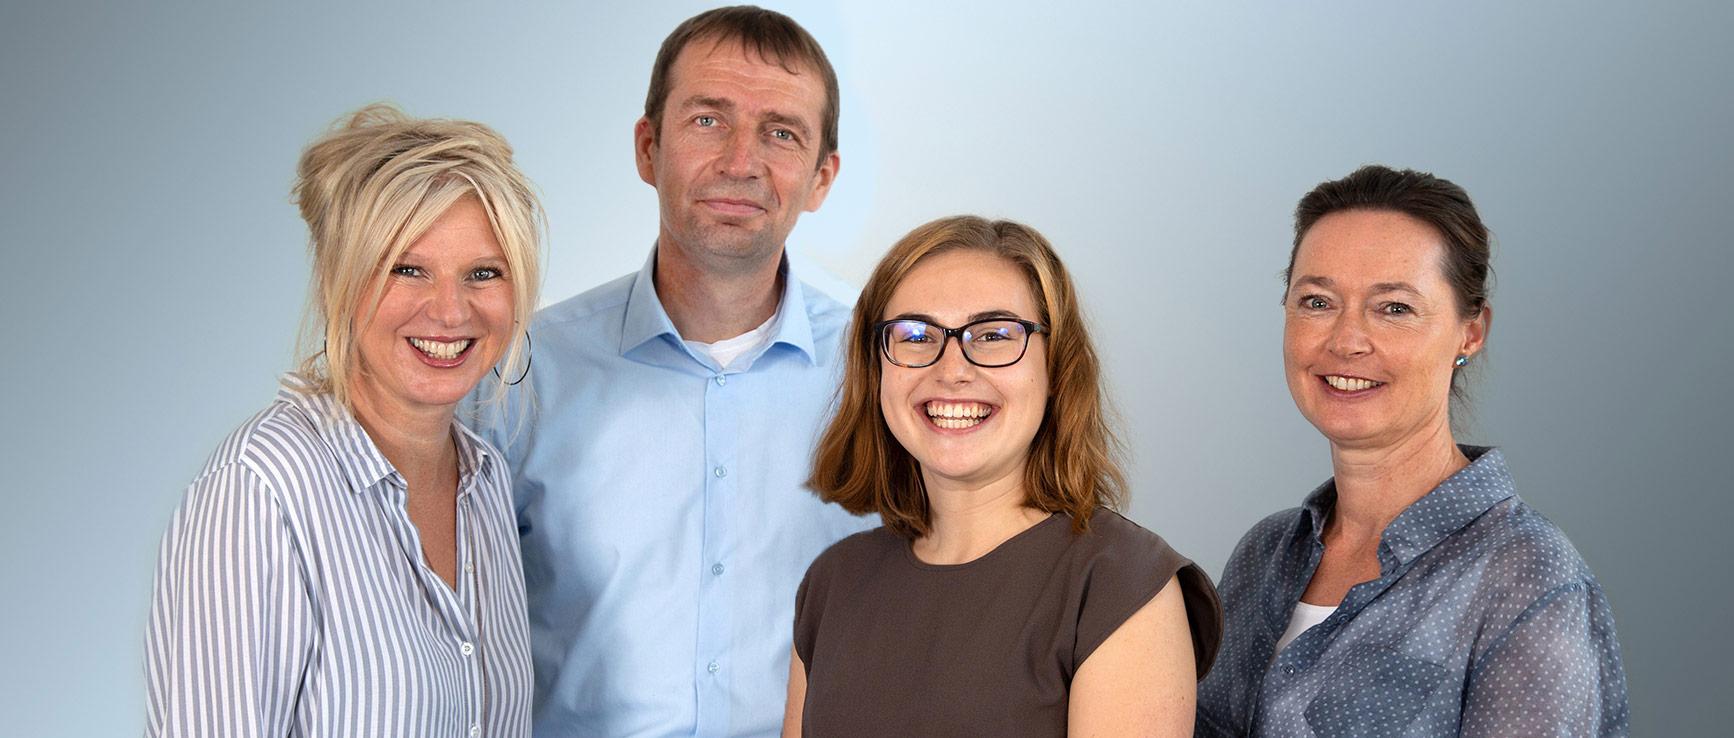 Mitarbeiter der Mediengruppe Magdeburg